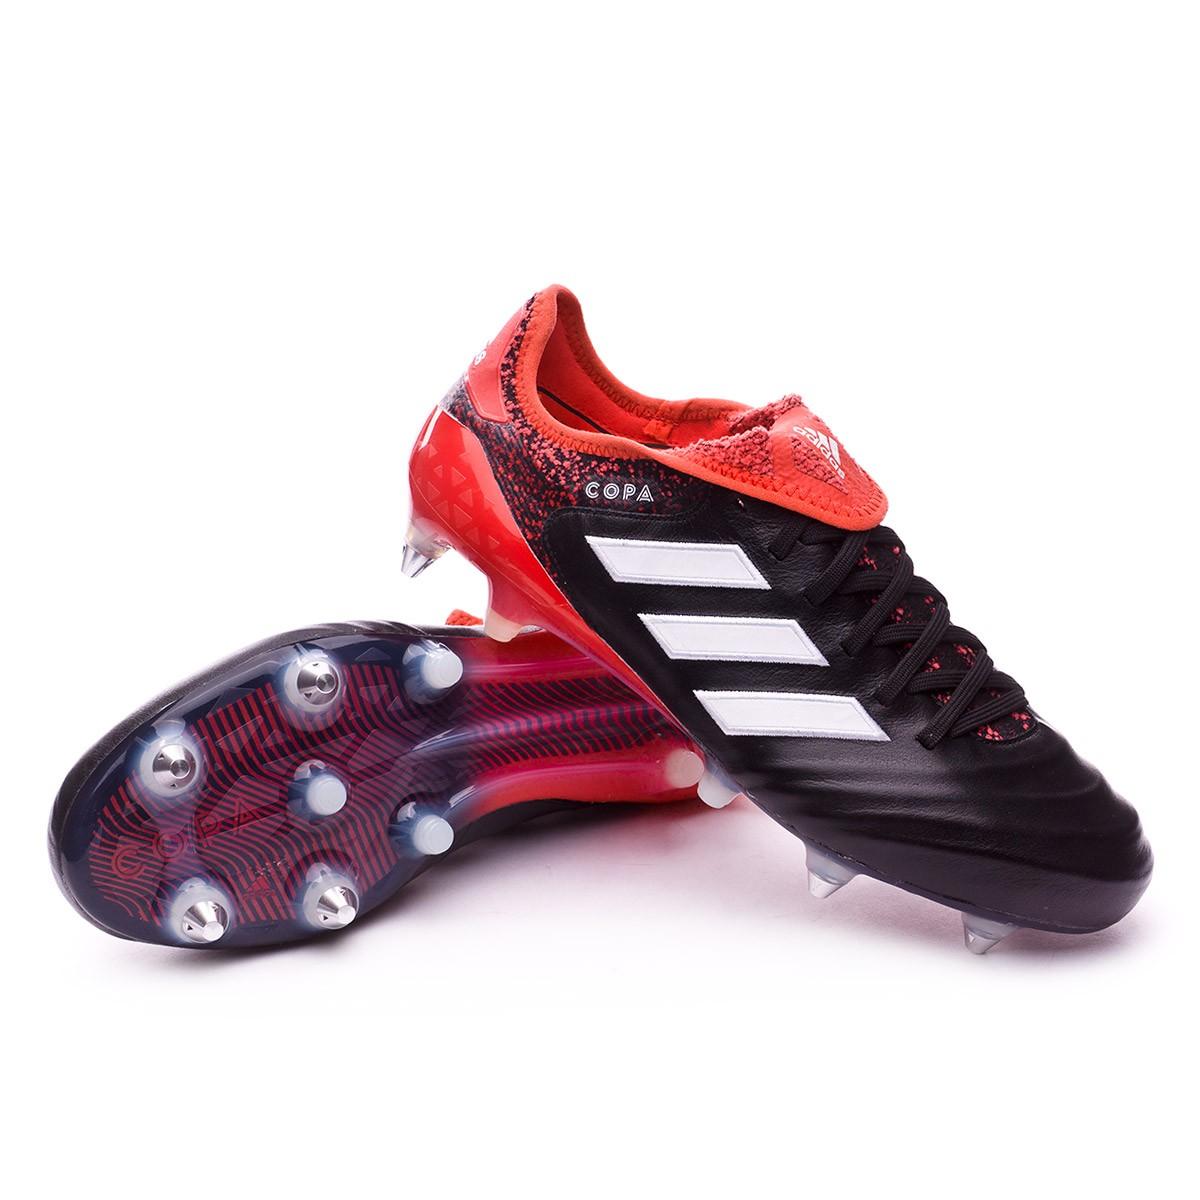 f07235fd8a3e Football Boots adidas Copa 18.1 SG Core black-White-Real coral ...